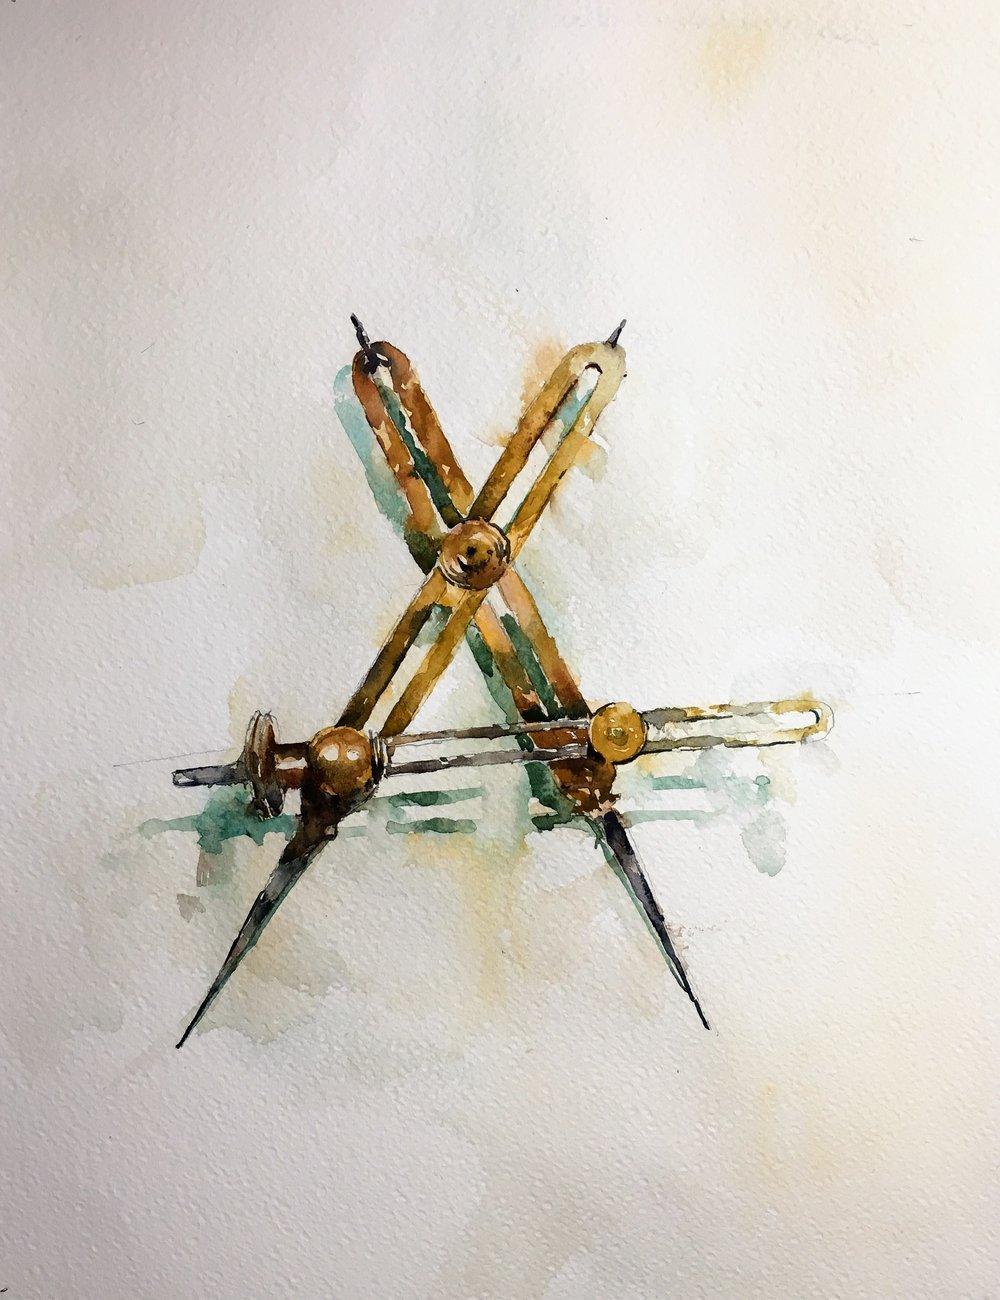 brass_callipers_watercolor.jpg